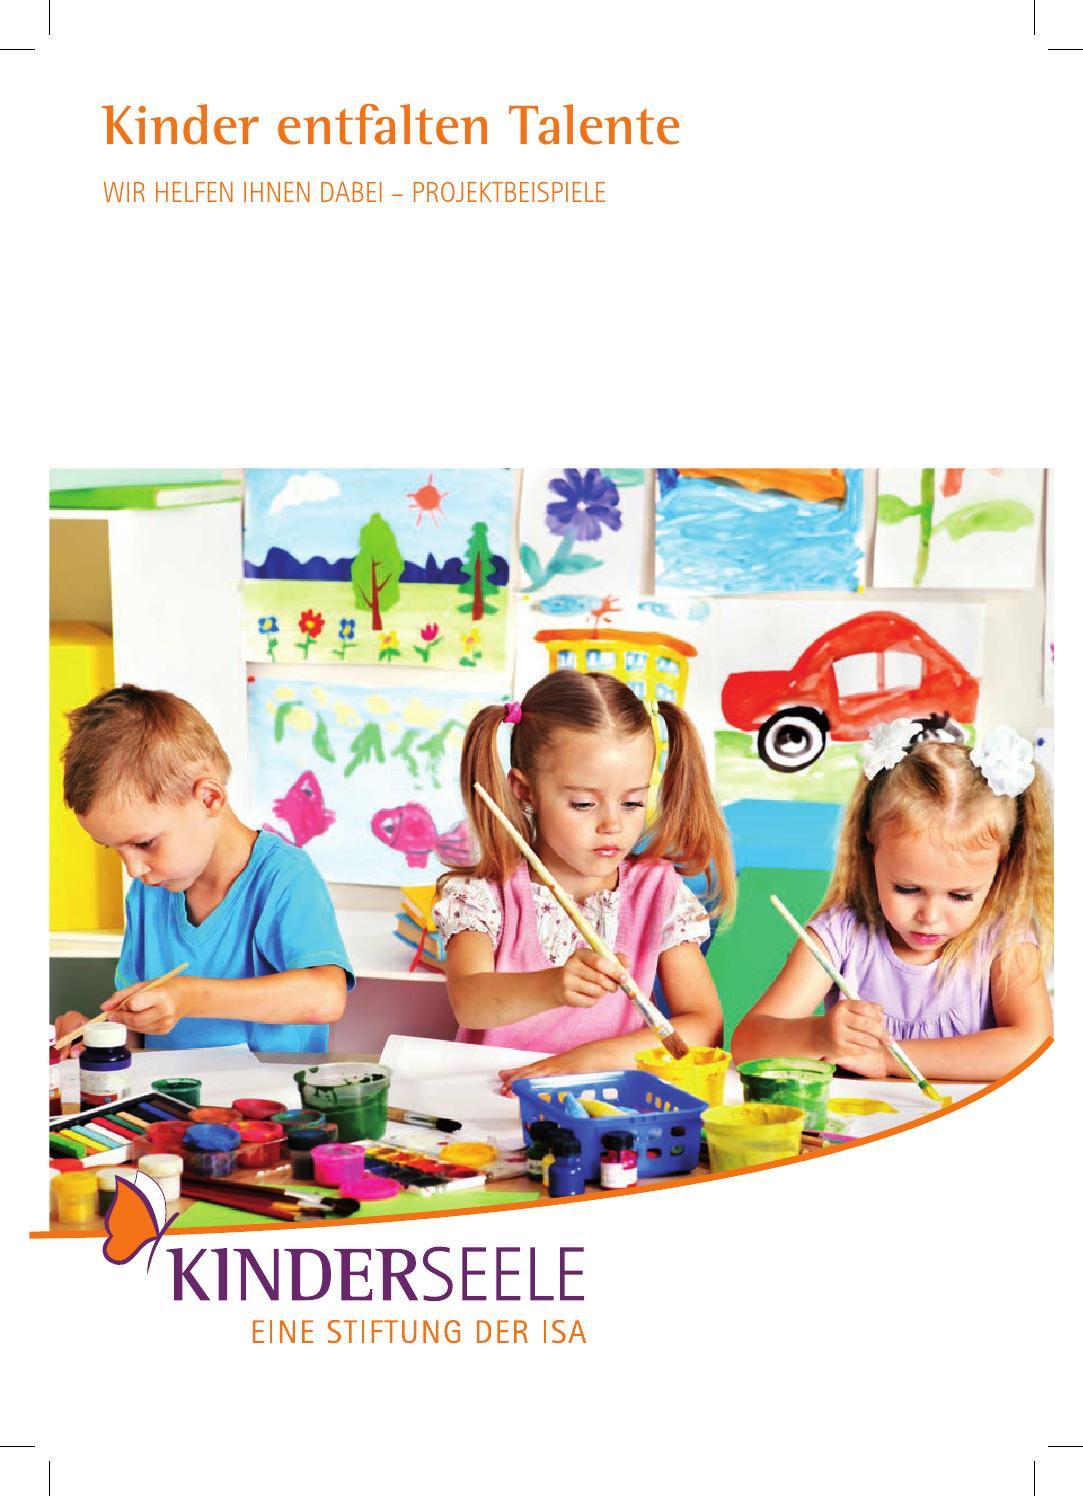 STIFTUNG KINDERSEELE Infobroschüre 2015 03 By PPS   Publicity Promotion  Socialmedia   Koblenz   Issuu